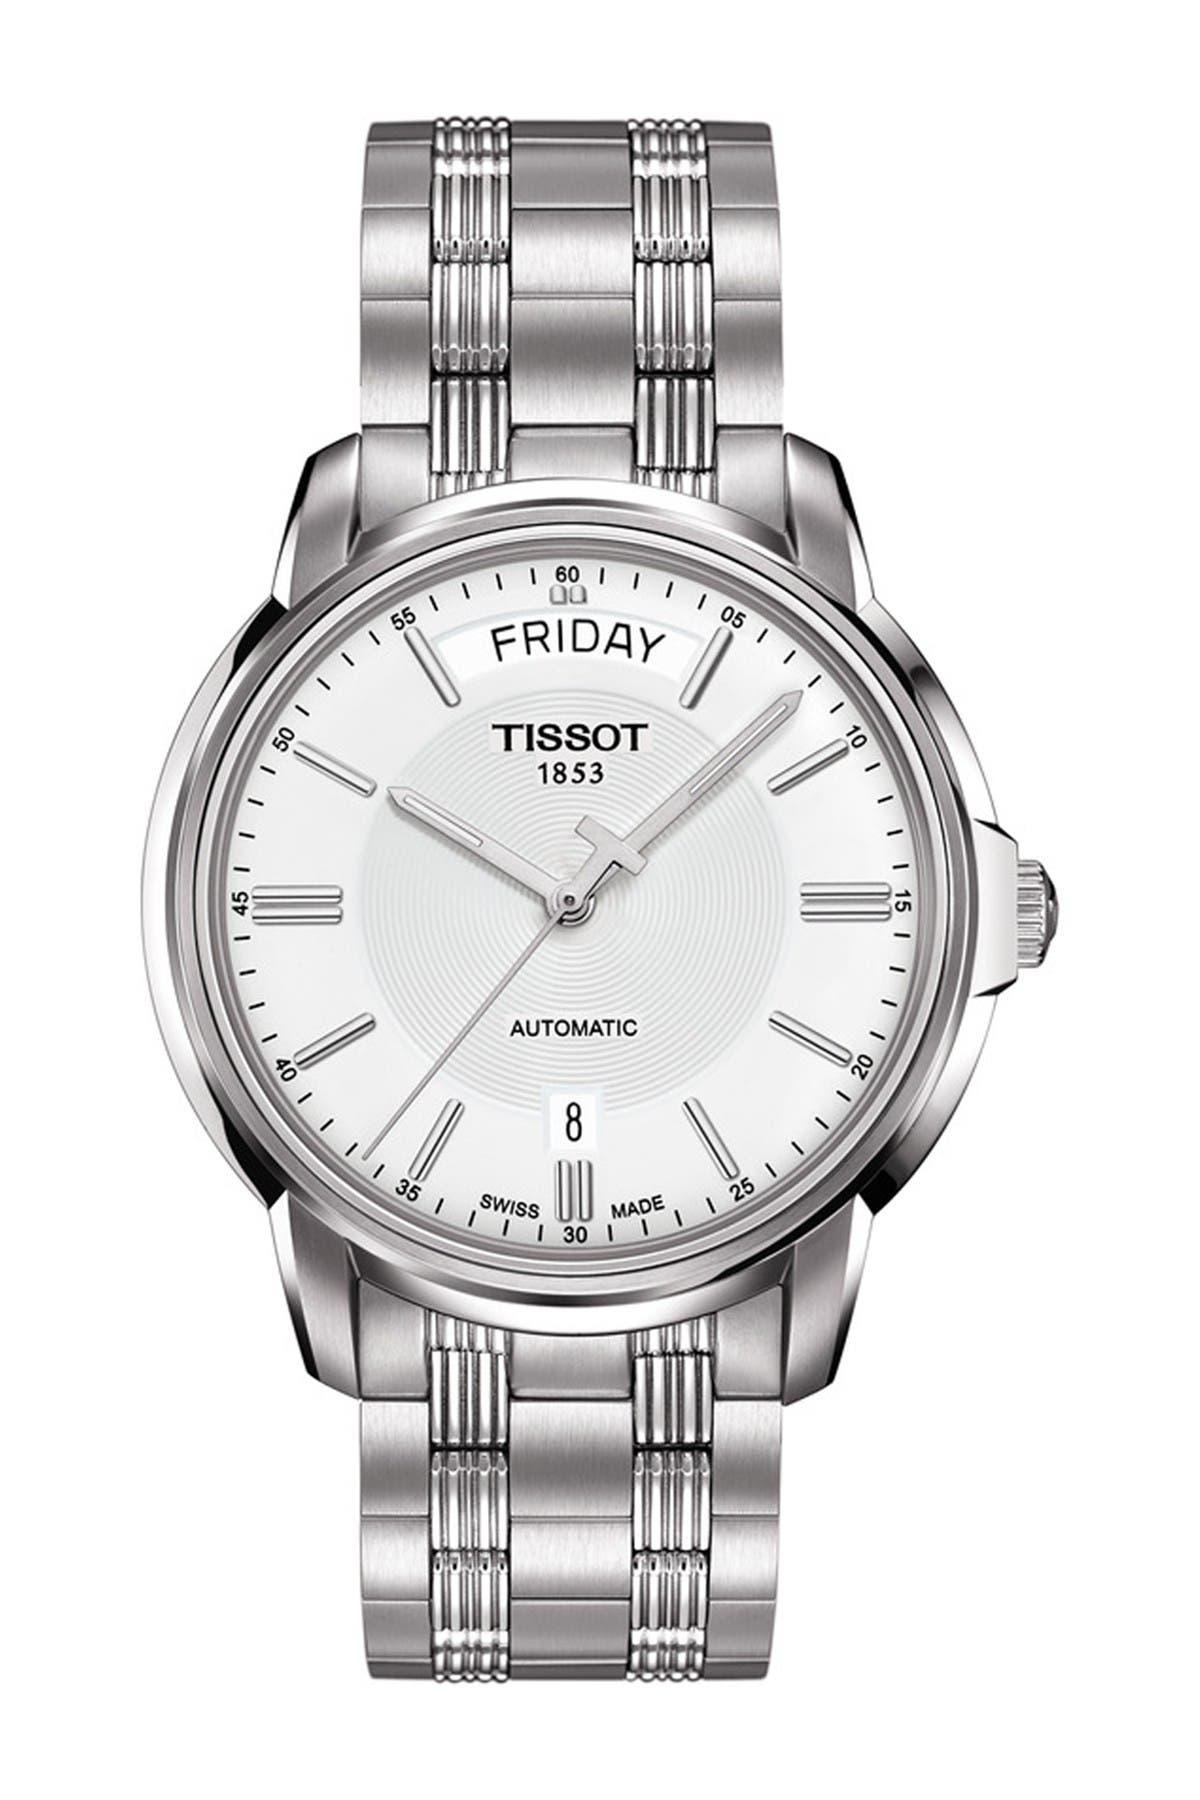 Image of Tissot Men's Automatic III Swiss Watch, 39mm